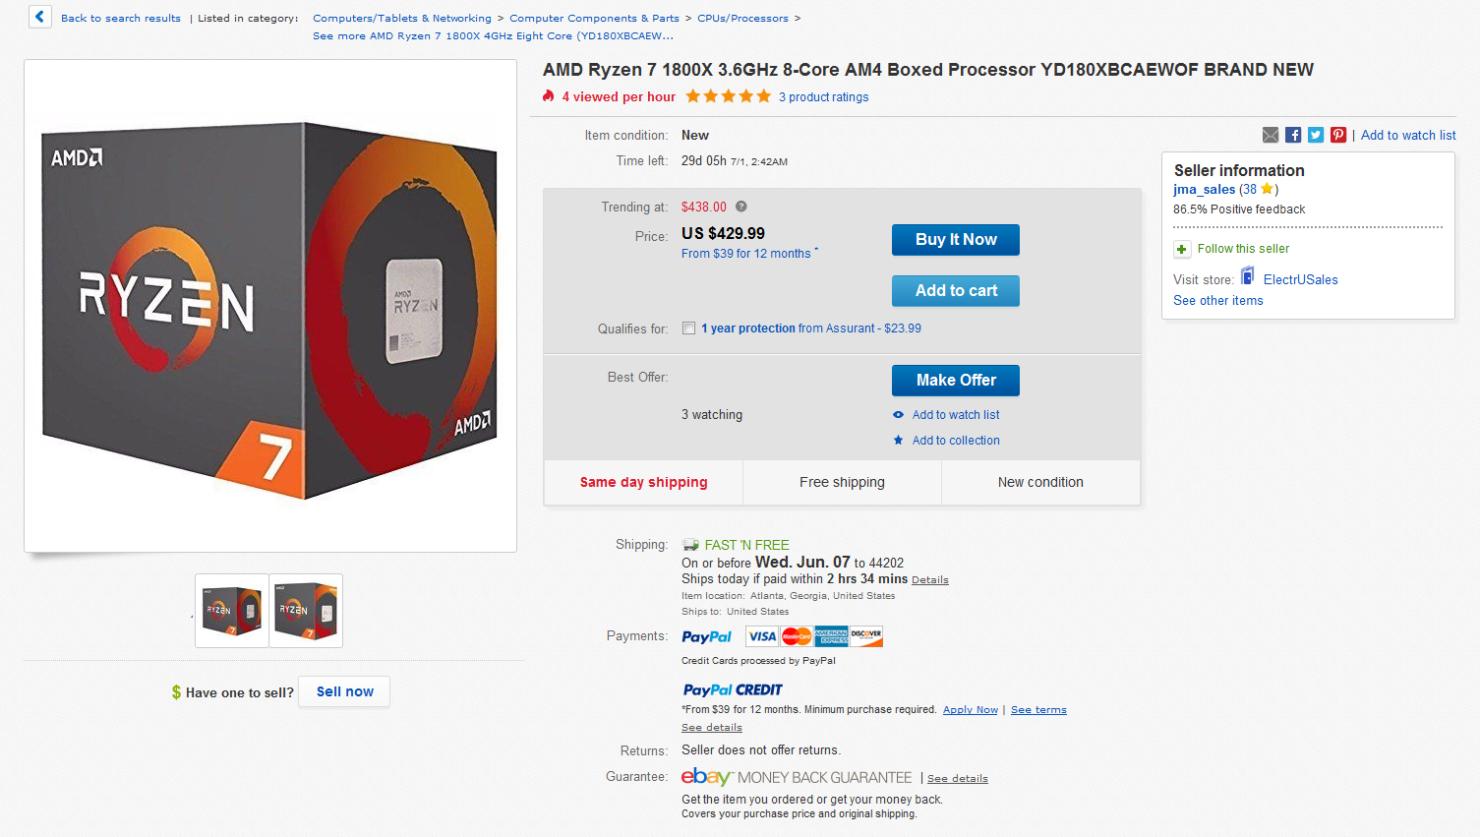 ryzen-7-1800x-ebay-price-cut